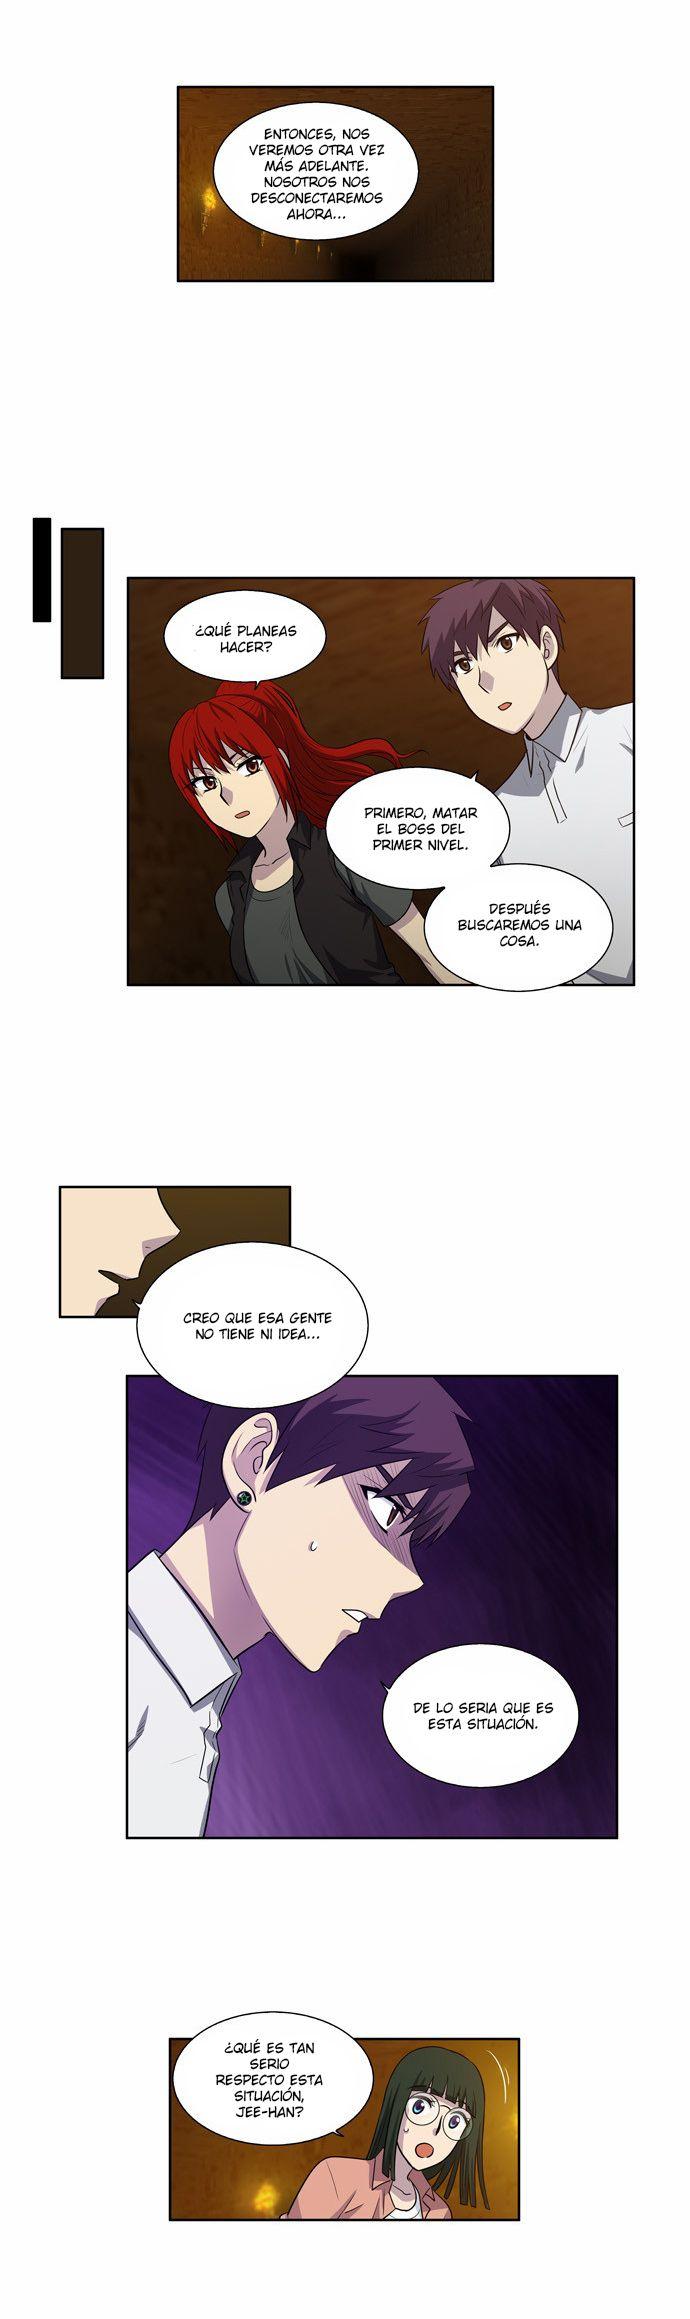 http://c5.ninemanga.com/es_manga/61/1725/482105/80f814e5d87e0ecc9c7d408771b79bd9.jpg Page 9